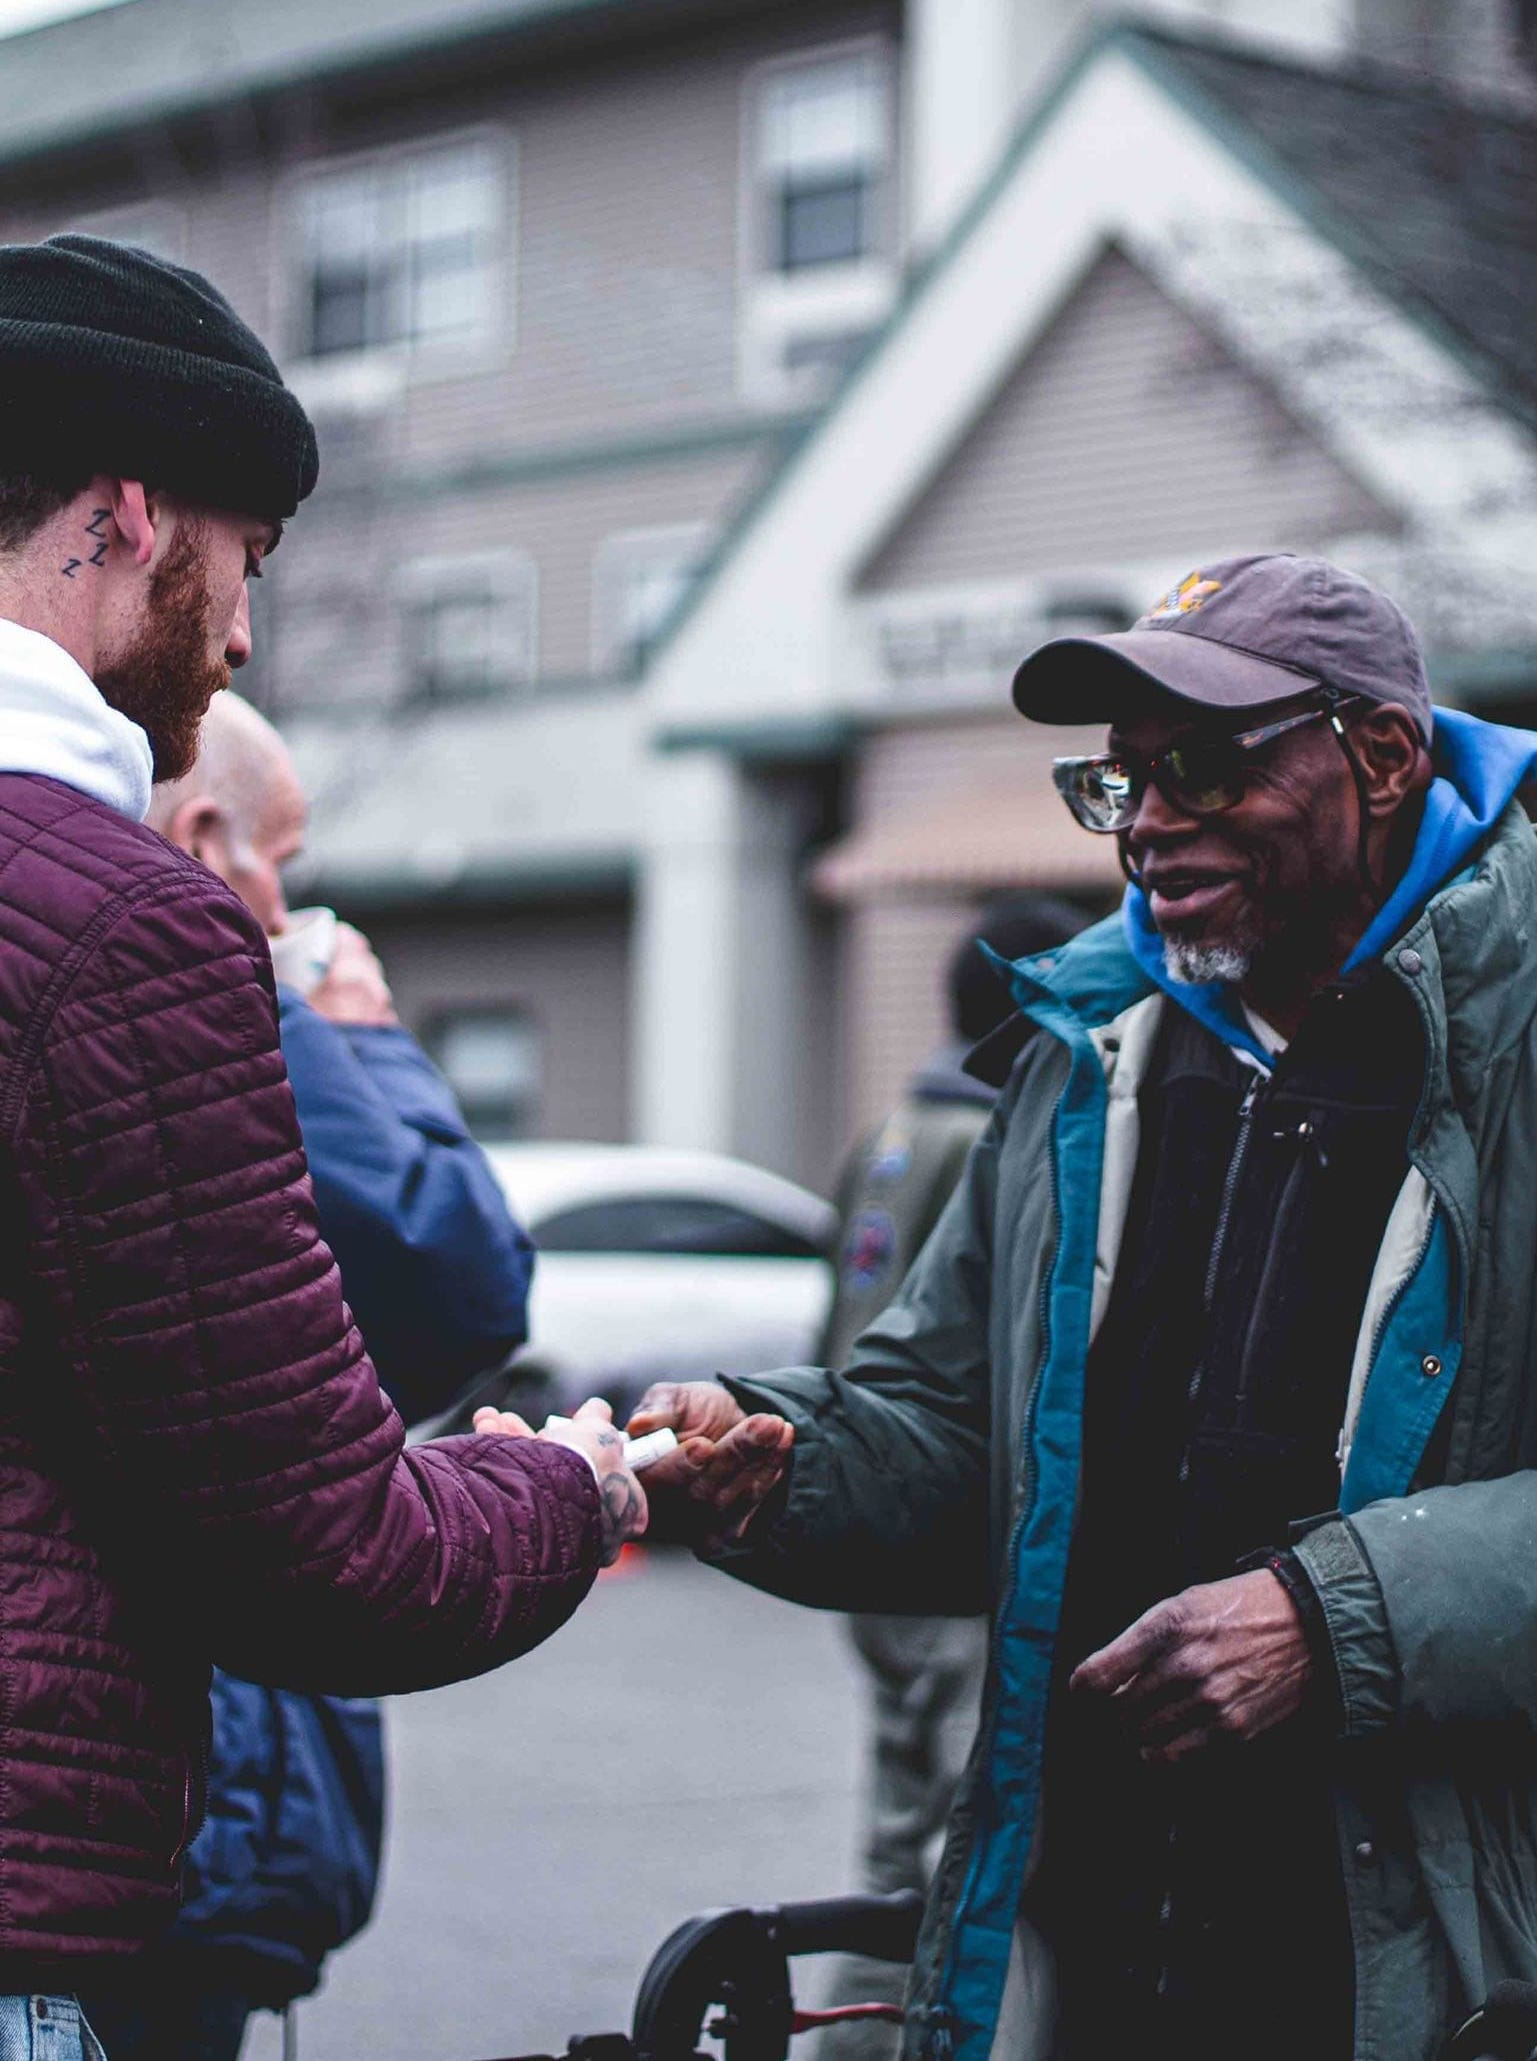 A Neighbor Idaho volunteer giving a man chapstick